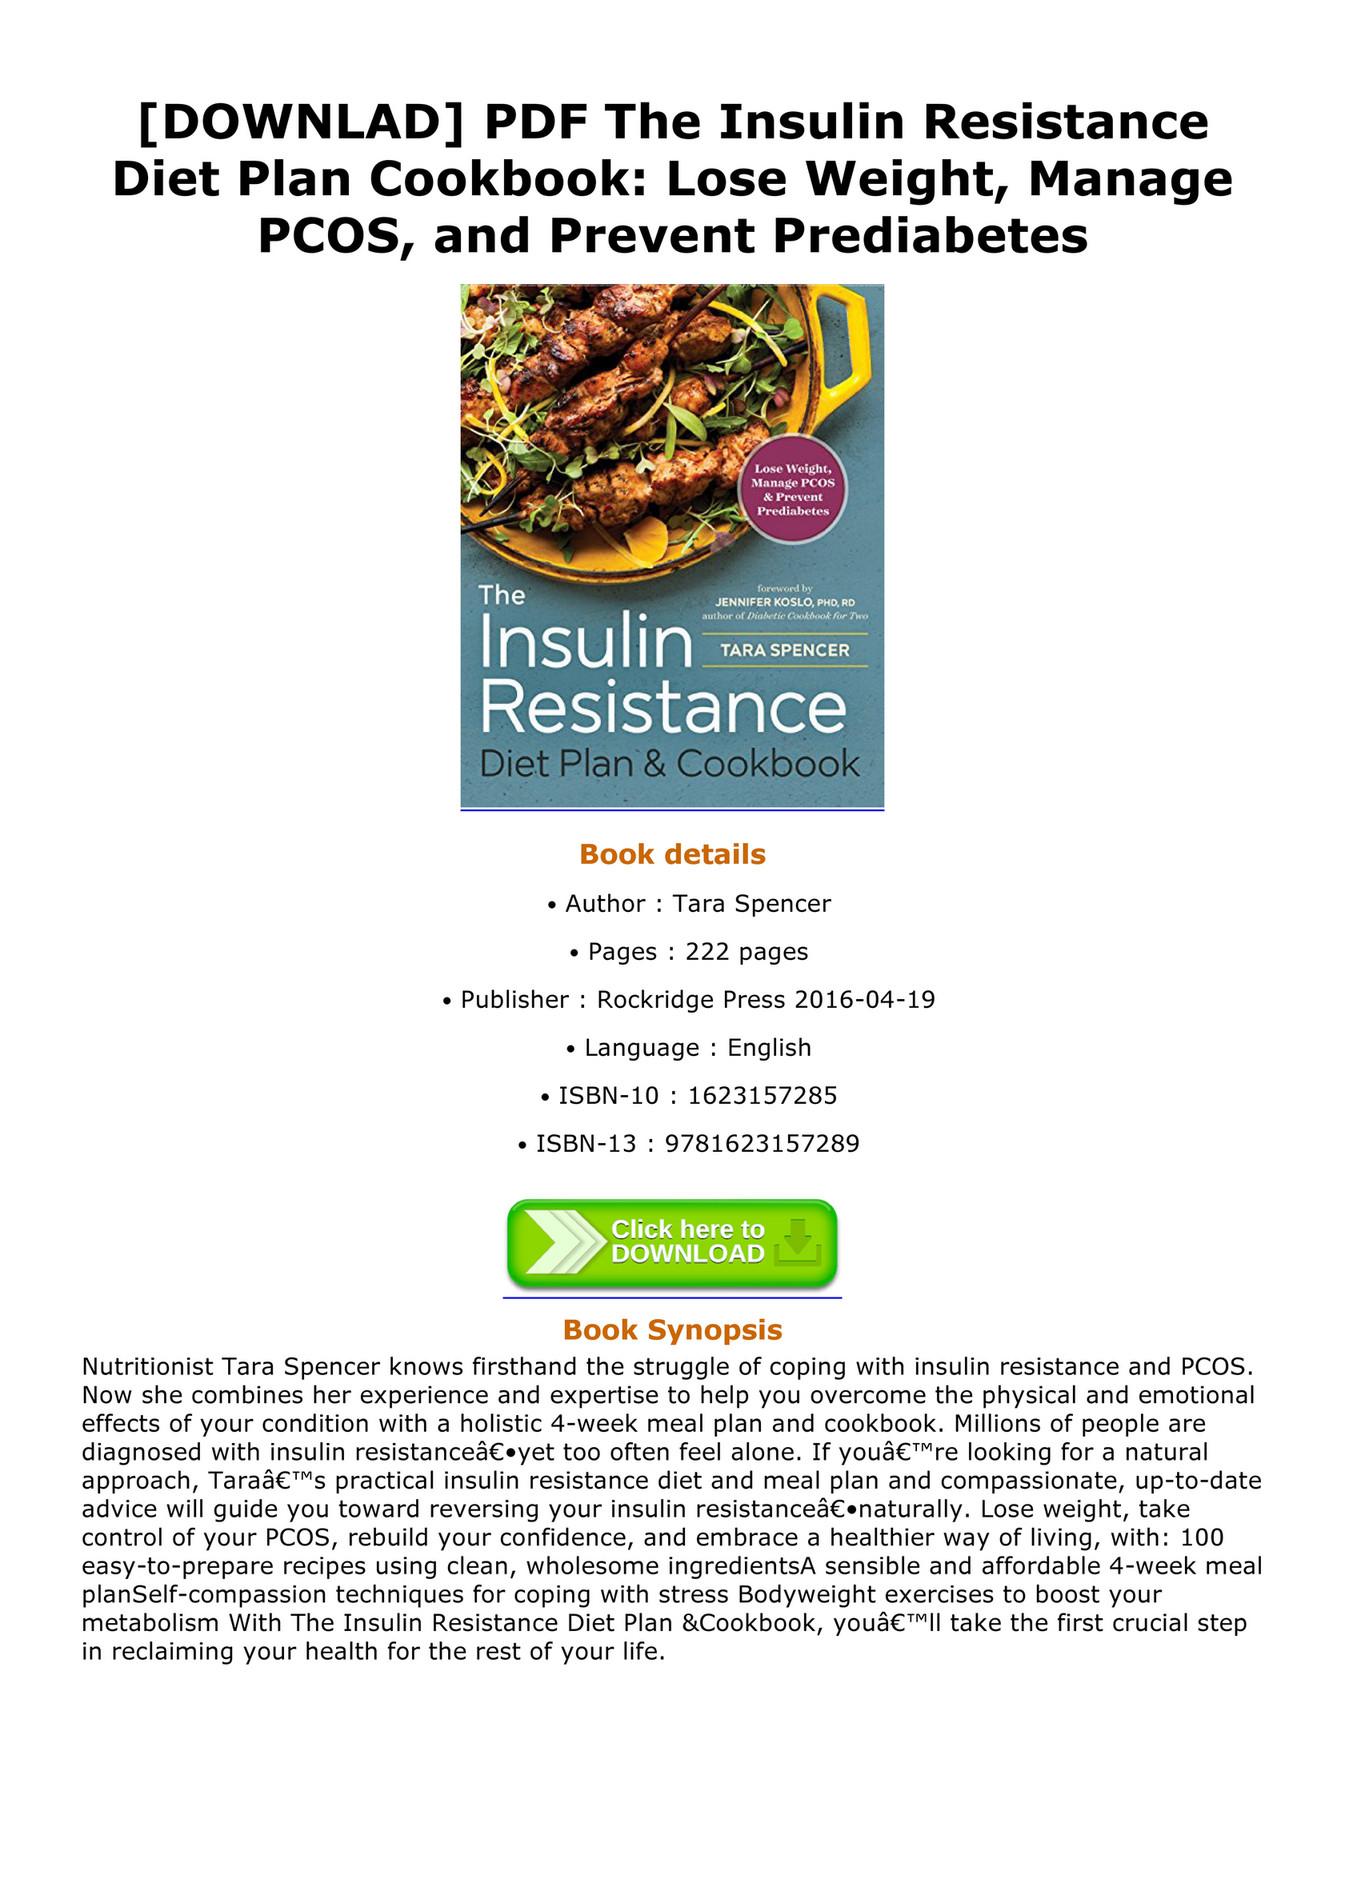 Glover BOOK DOWNLAD PDF The Insulin Resistance Diet Plan Cookbook